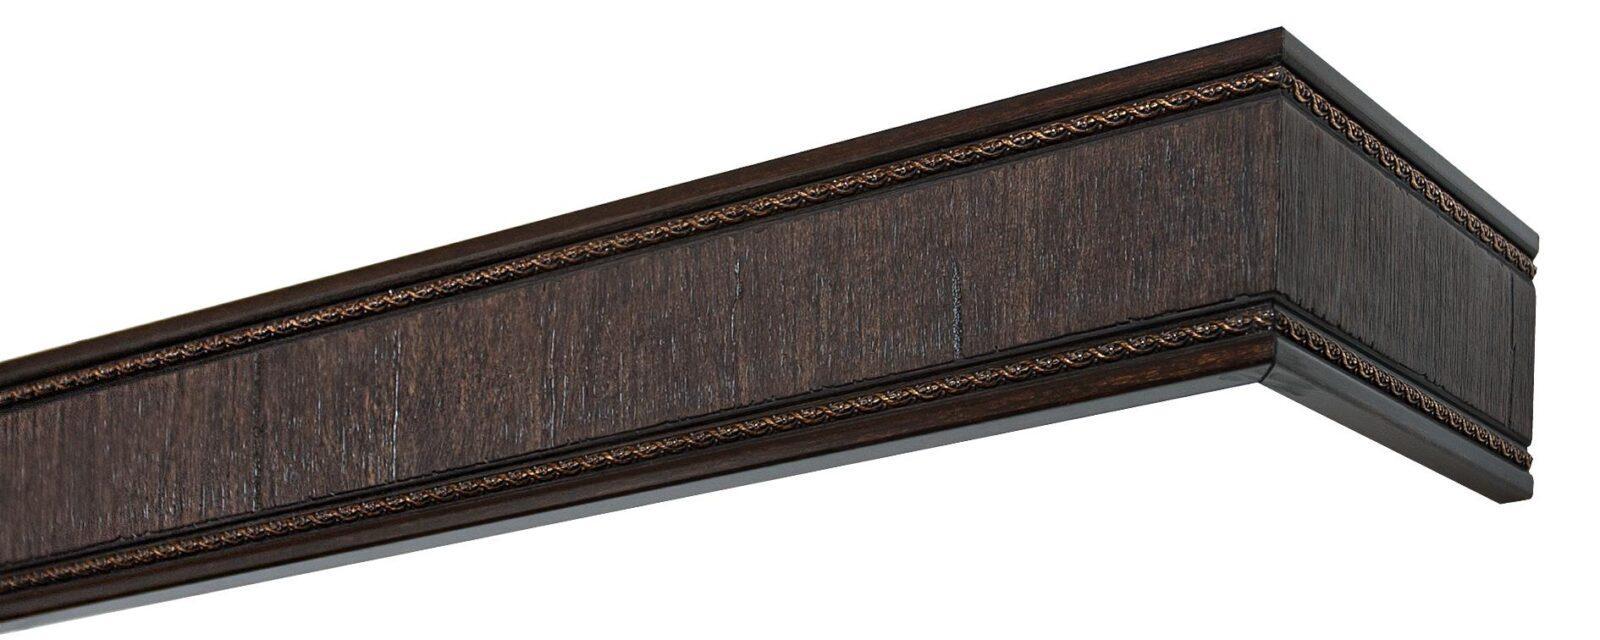 Комплект боковин для карниза Унисон венге 80мм